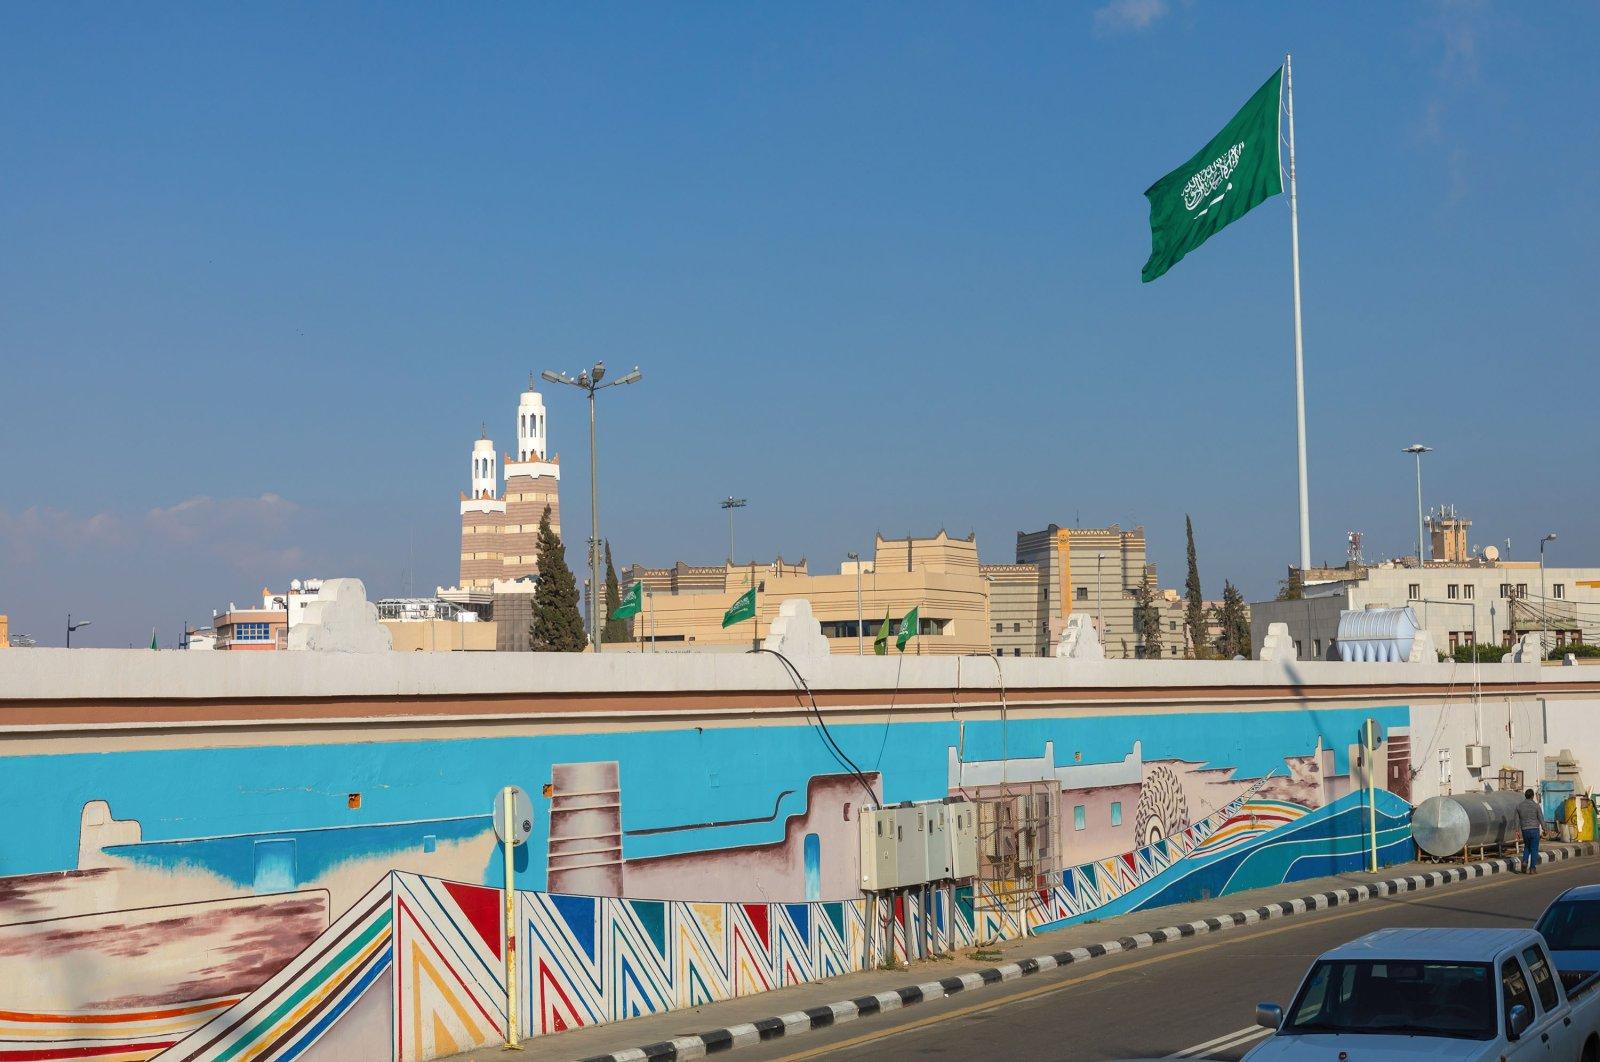 The Saudi Arabian flag flies in front of a fresco, Asir province, Abha, Saudi Arabia, Jan 3, 2020. (Getty Images)